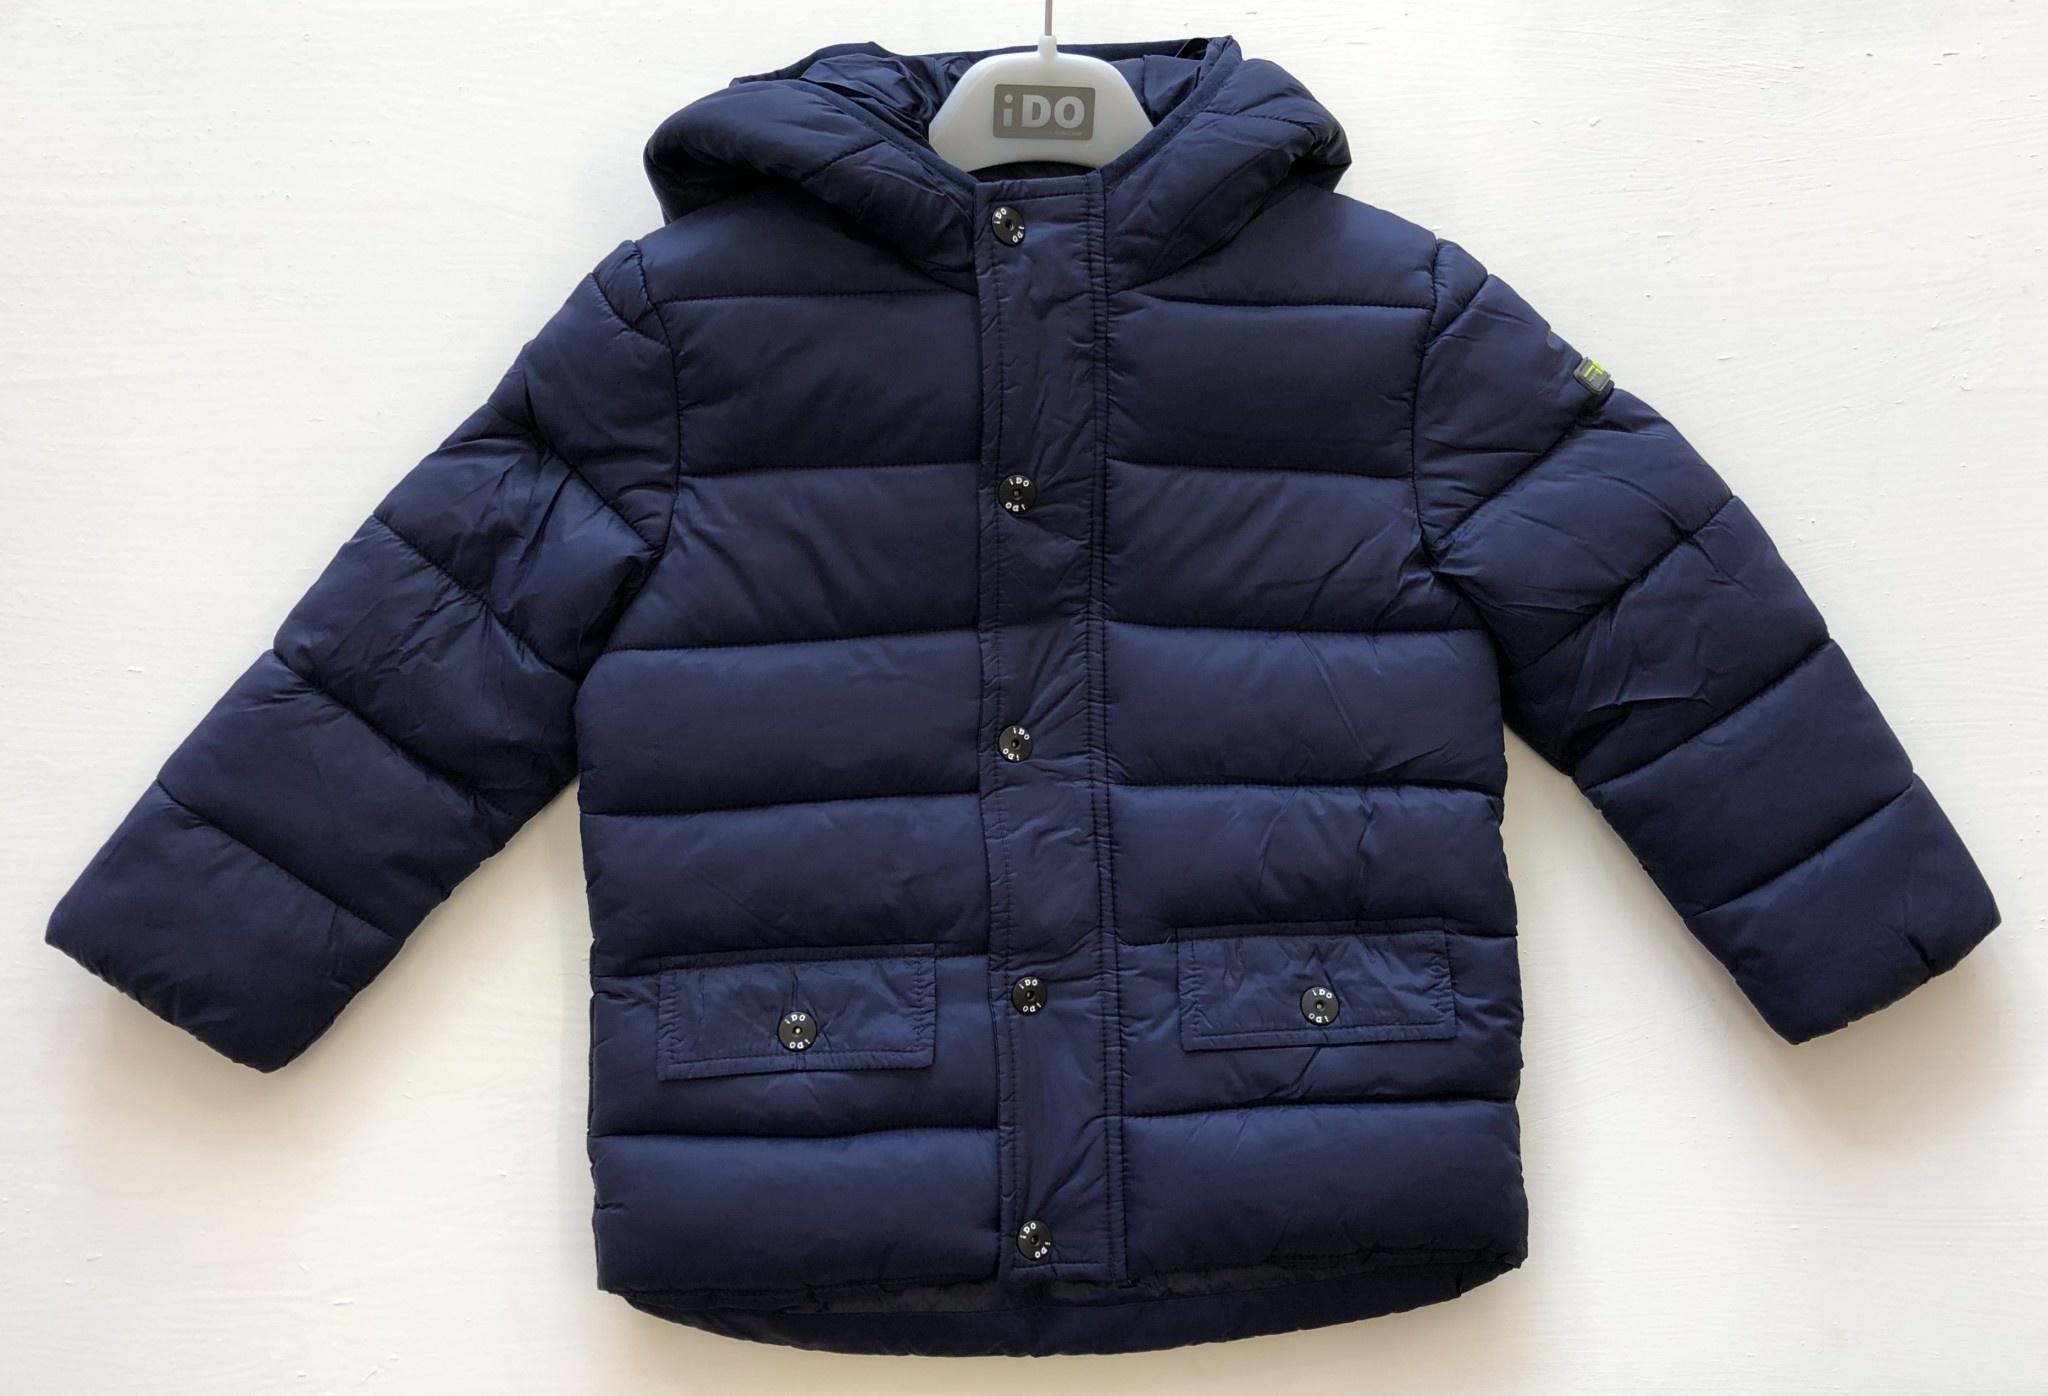 Ido IDo K503 Navy Thermal Padded Jacket